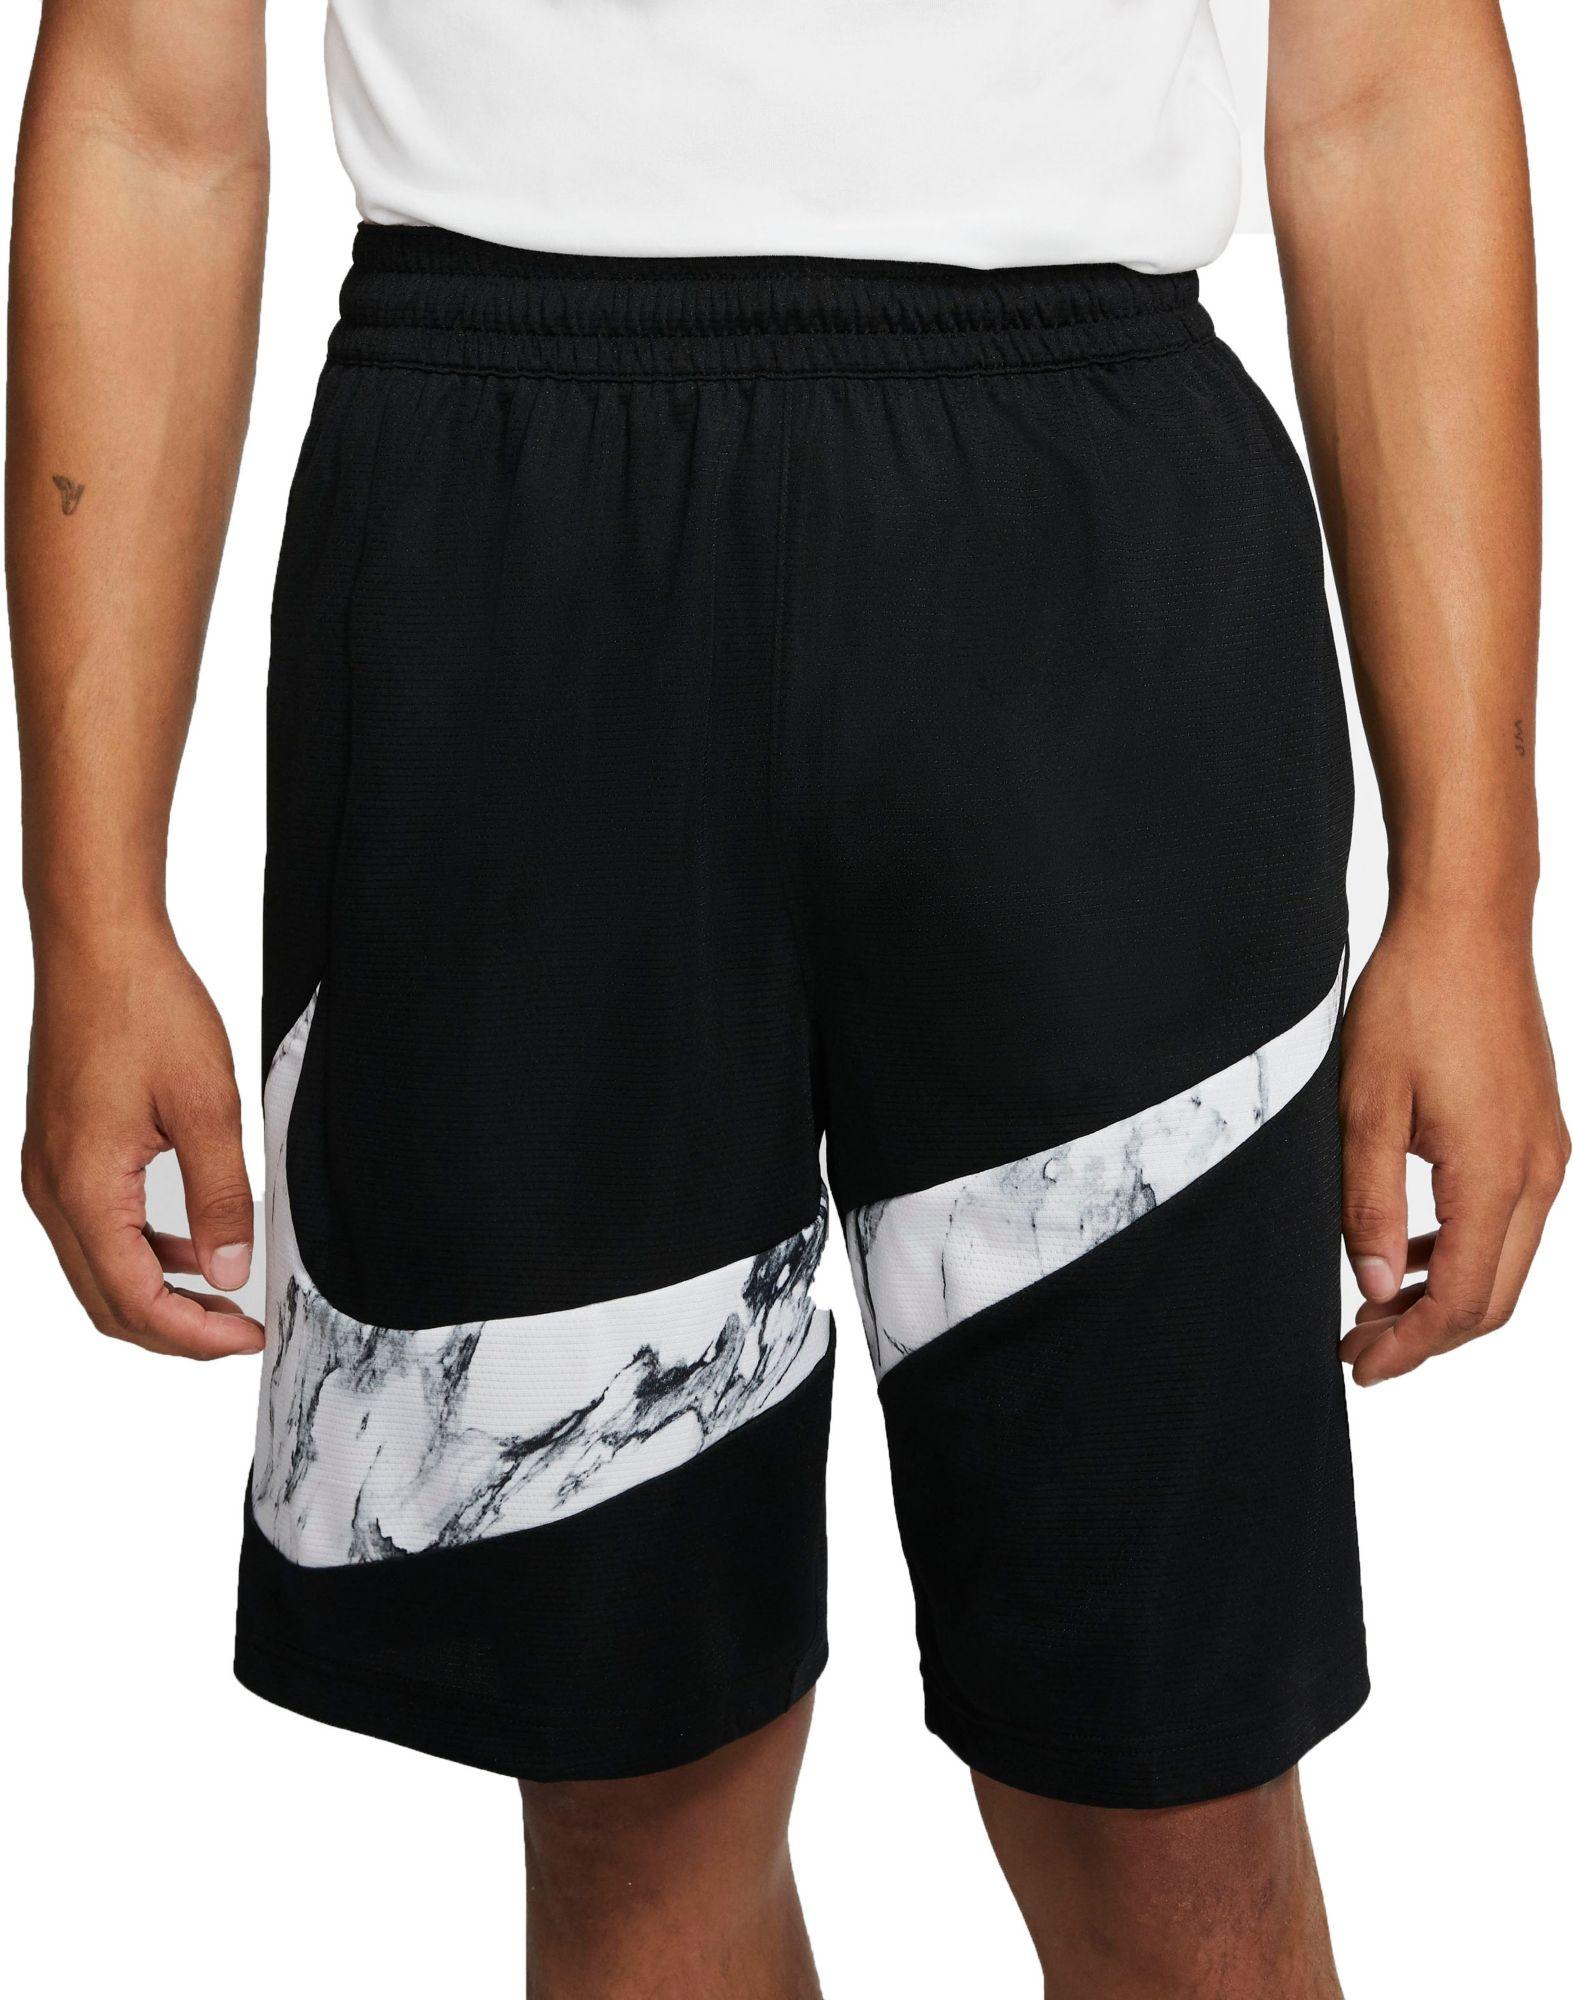 men's nike black basketball shorts